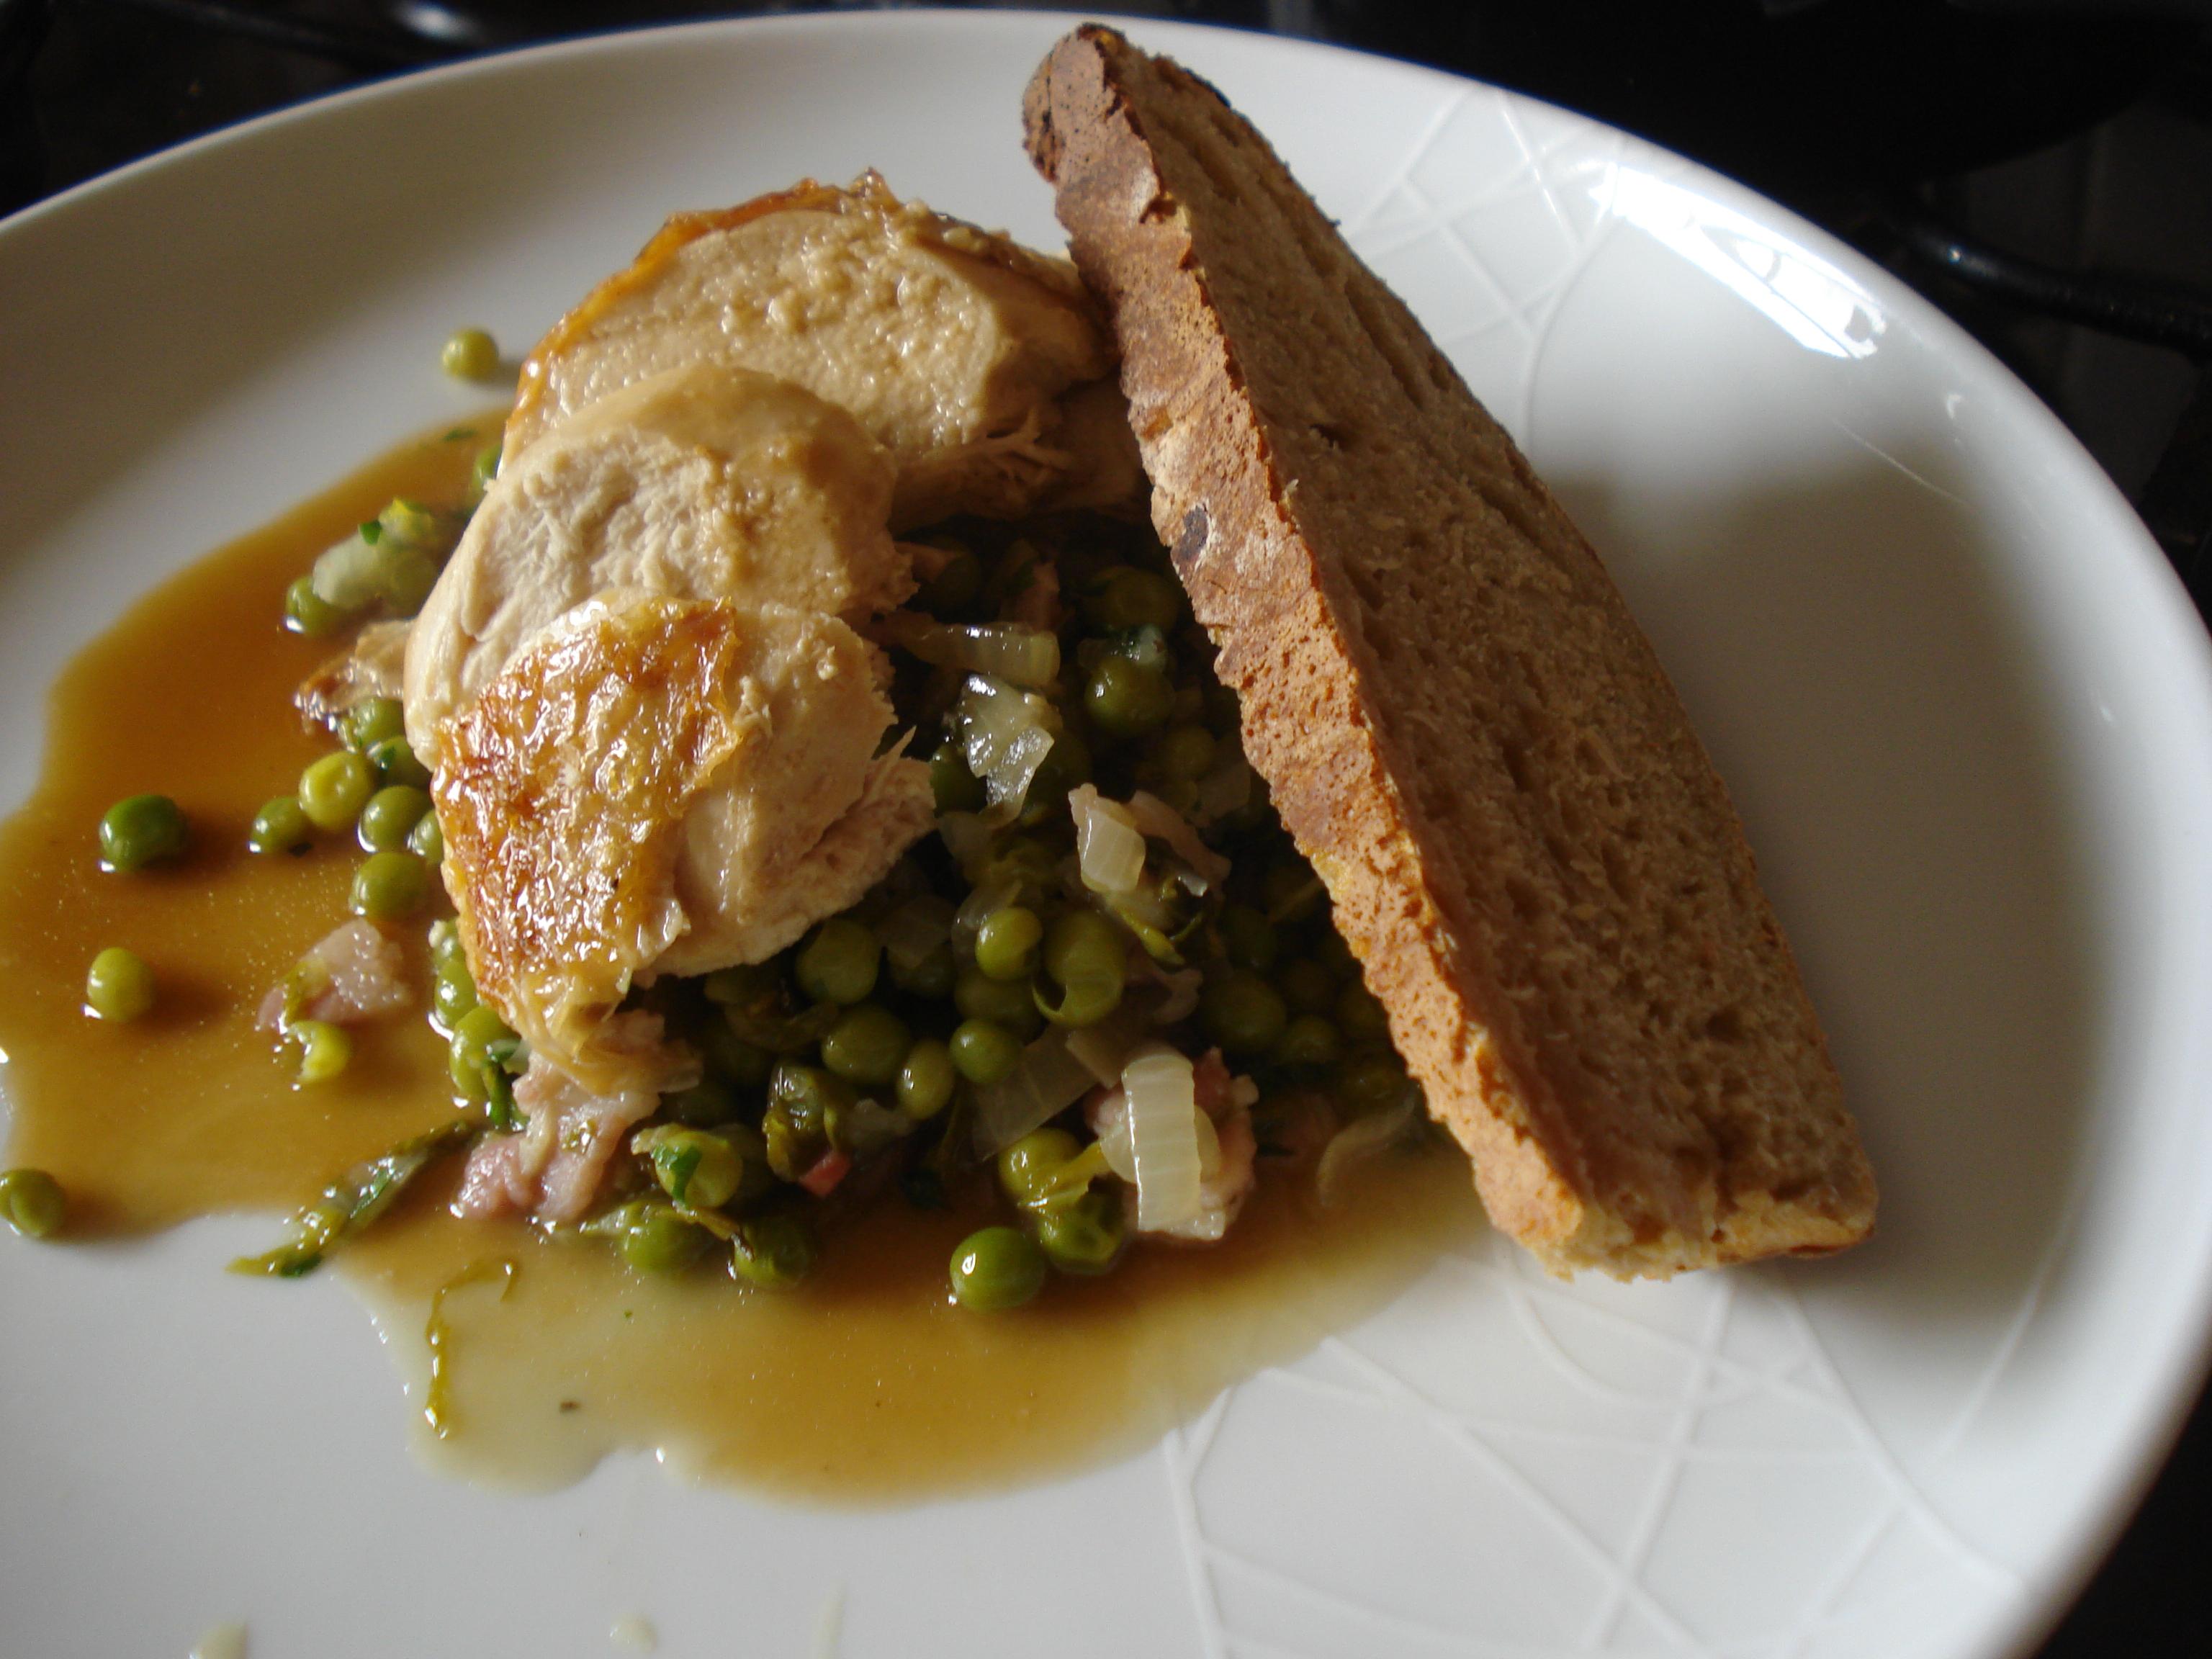 roast chicken with petits pois a la francais and sourdough bread